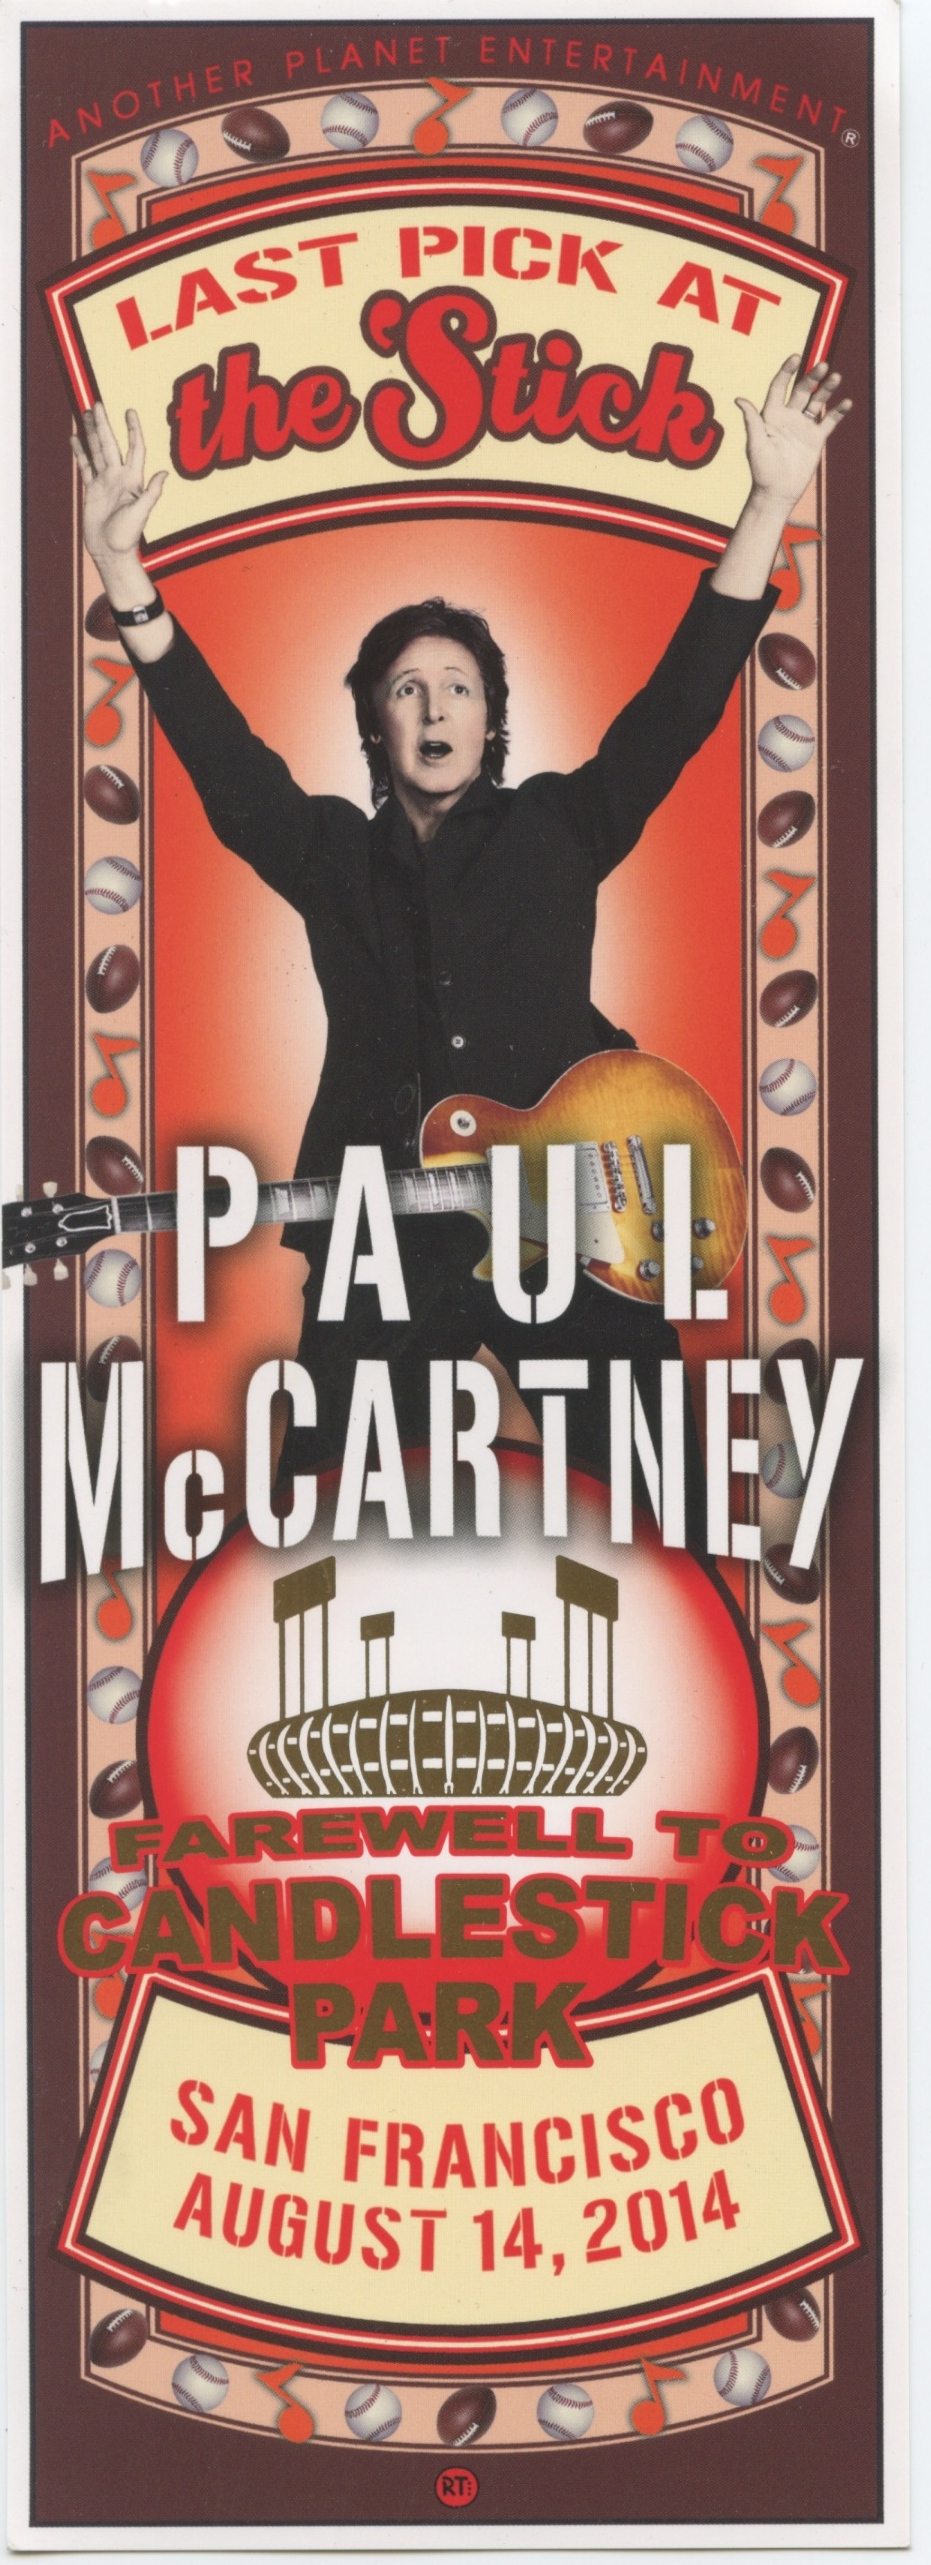 The Beatles Polska: Paul McCartney zagra na stadionie Candlestick Park!